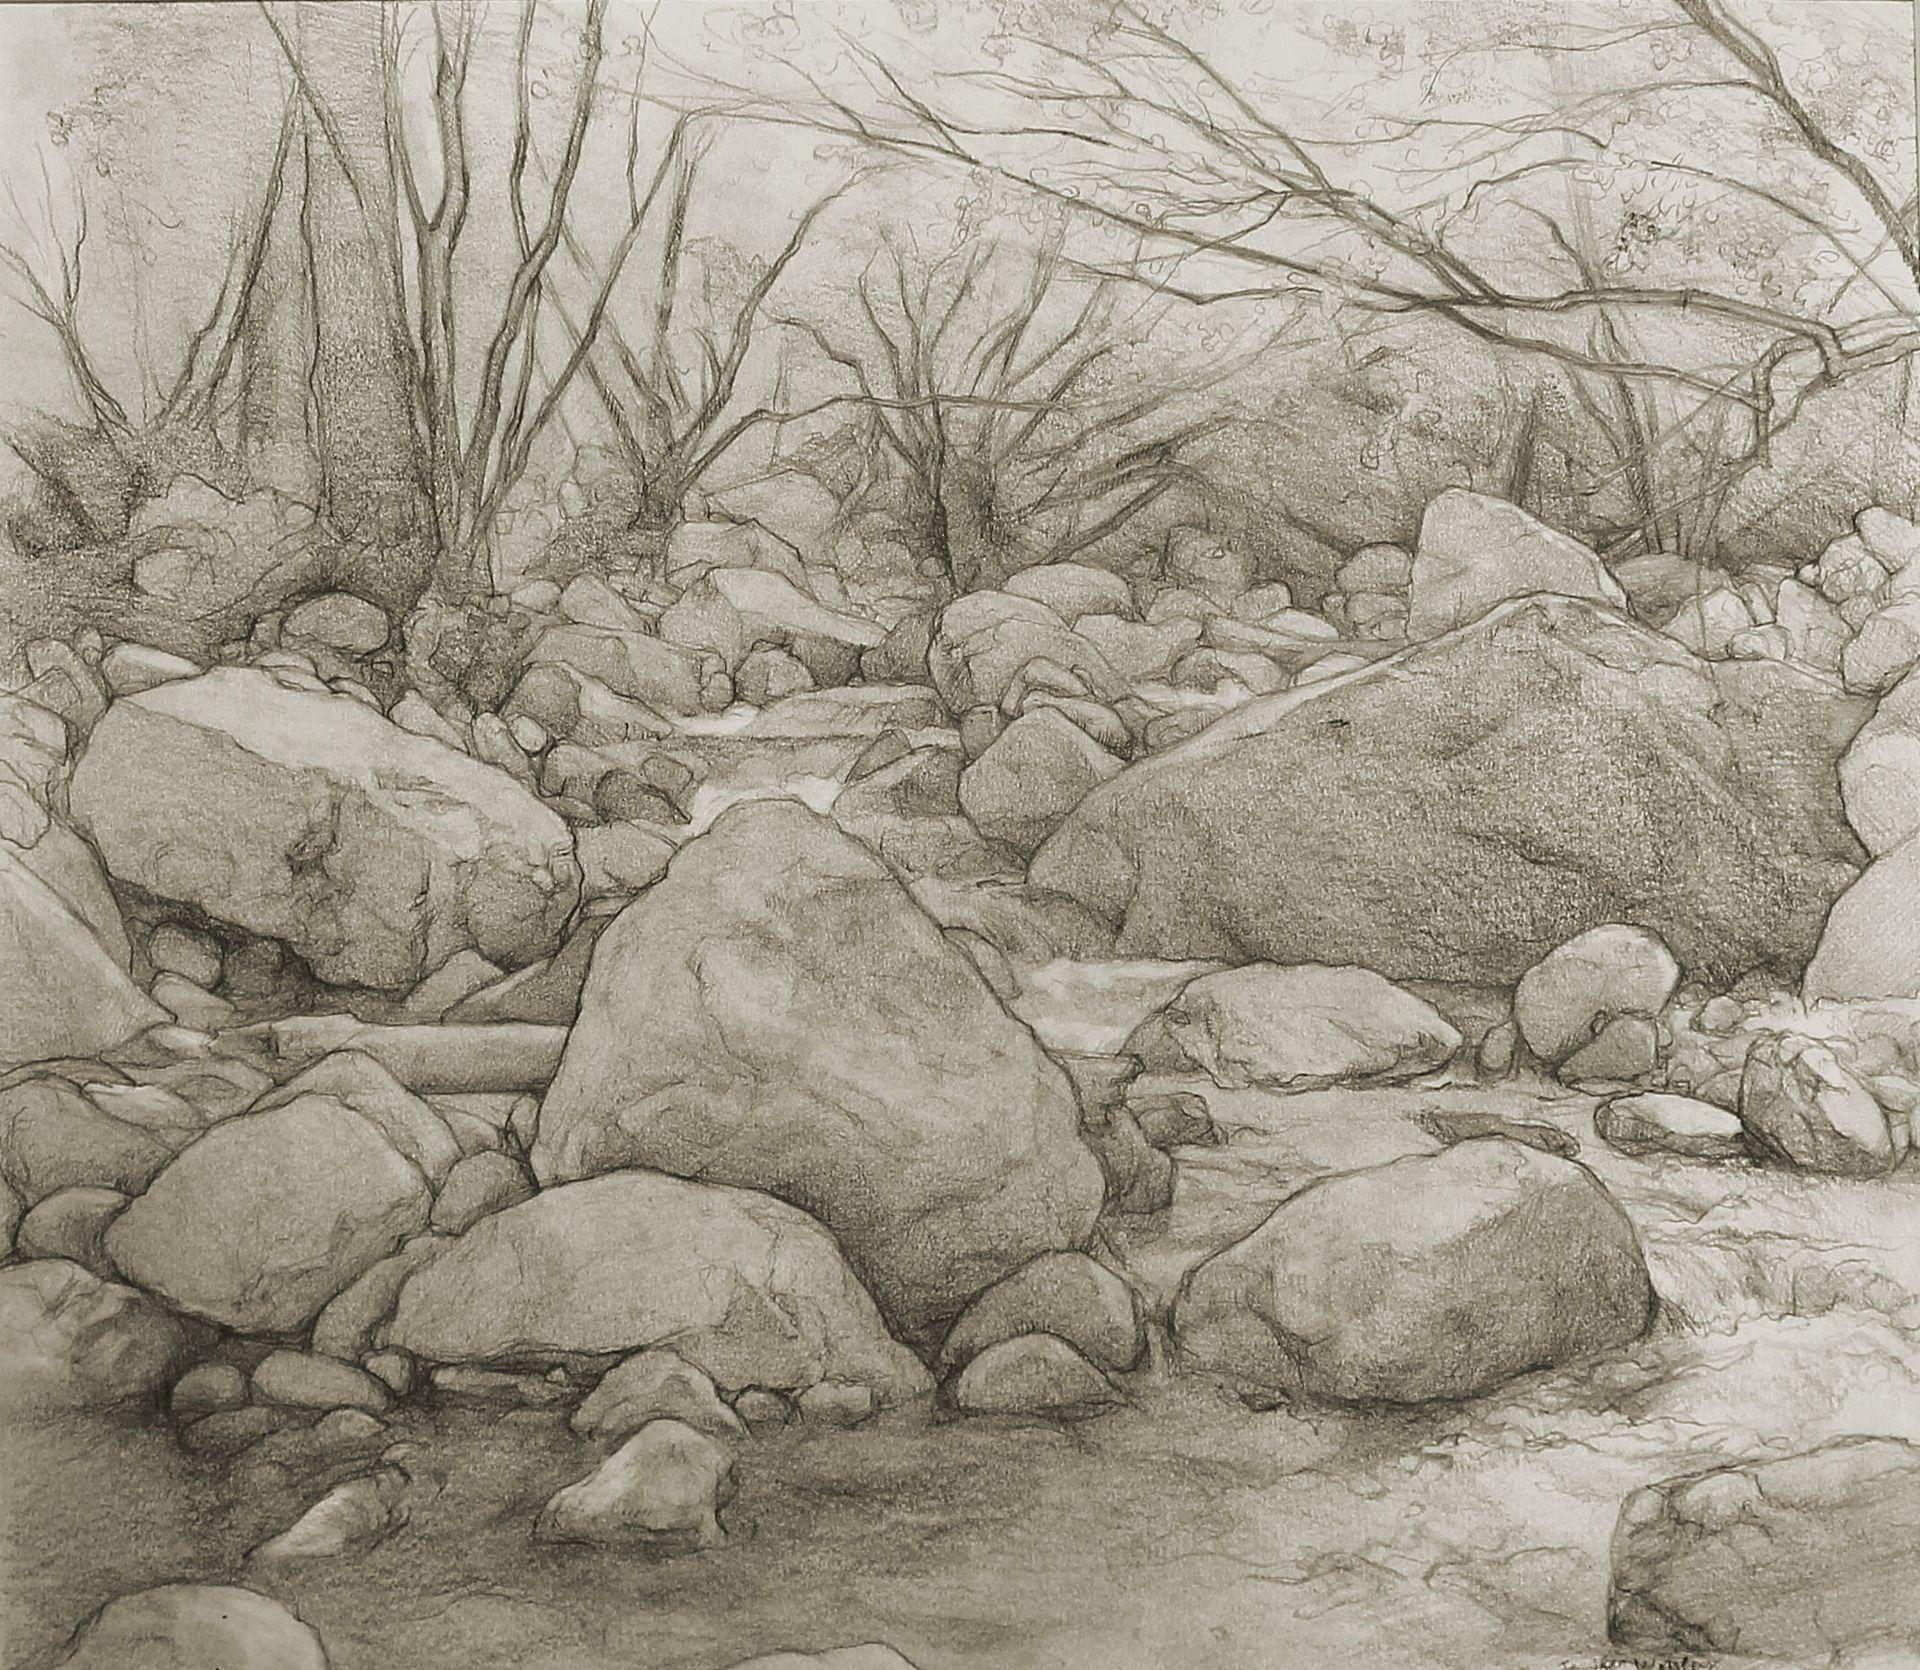 1920x1670 Jennifer Worsley Drawings And Woodblock Prints